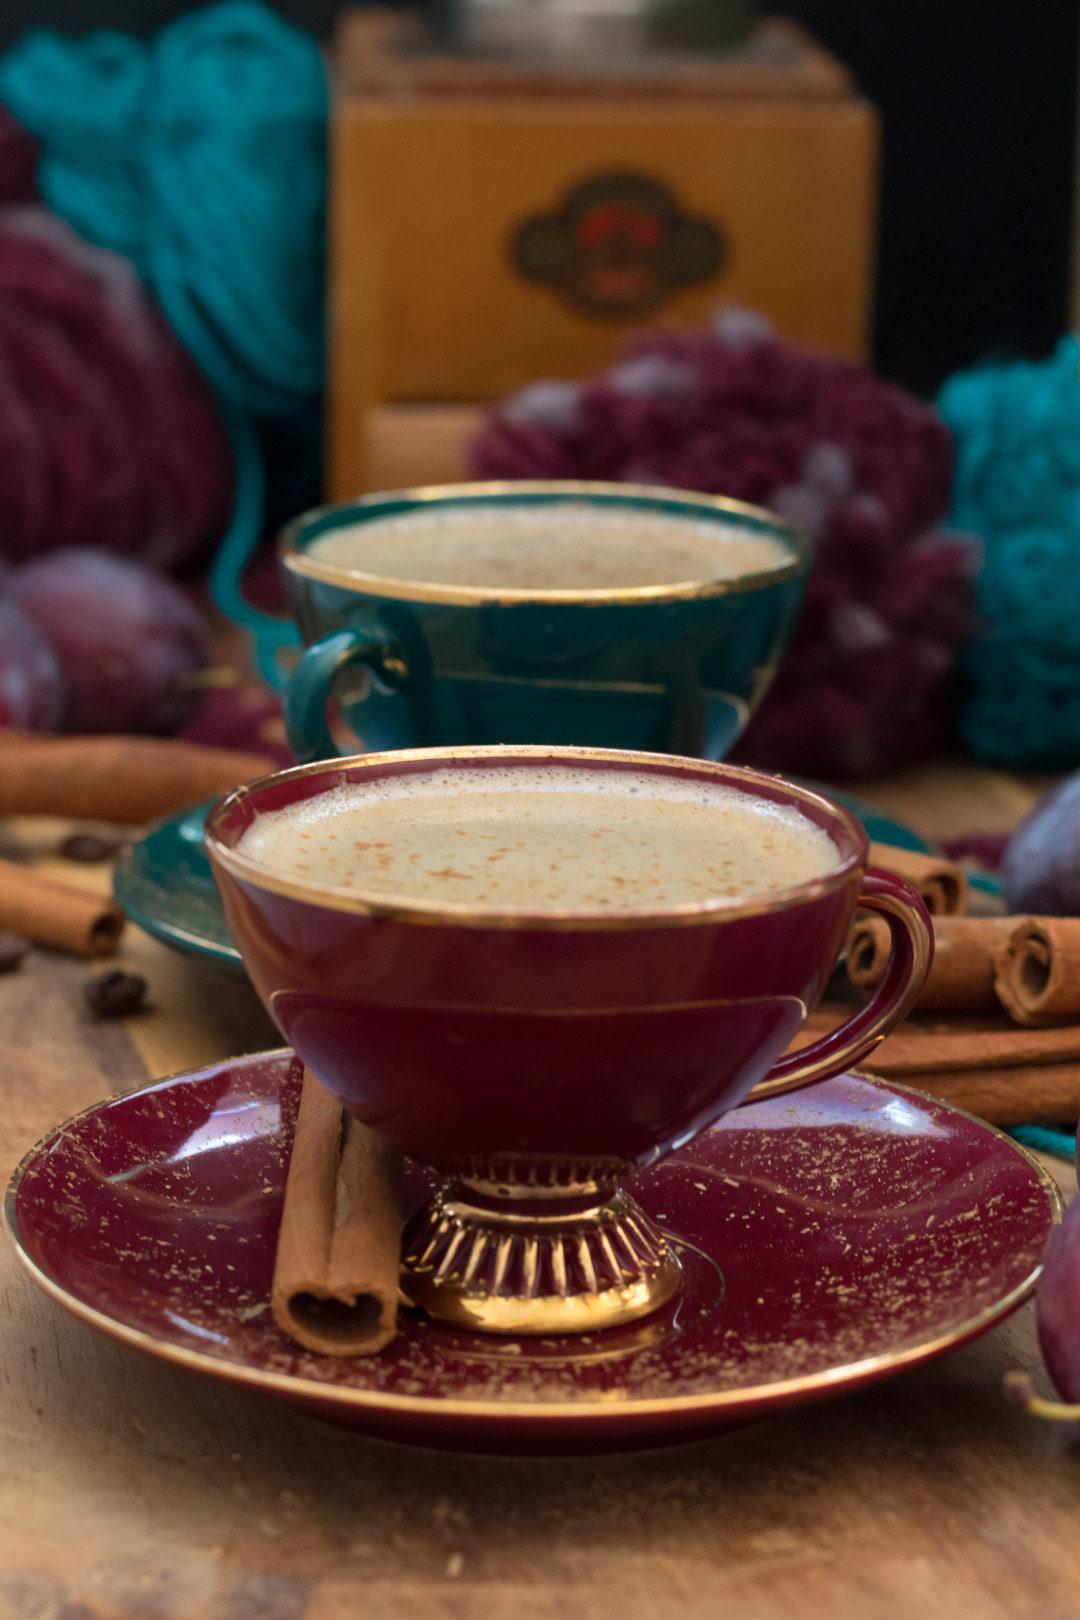 cinnamon coffee with coffee grinder